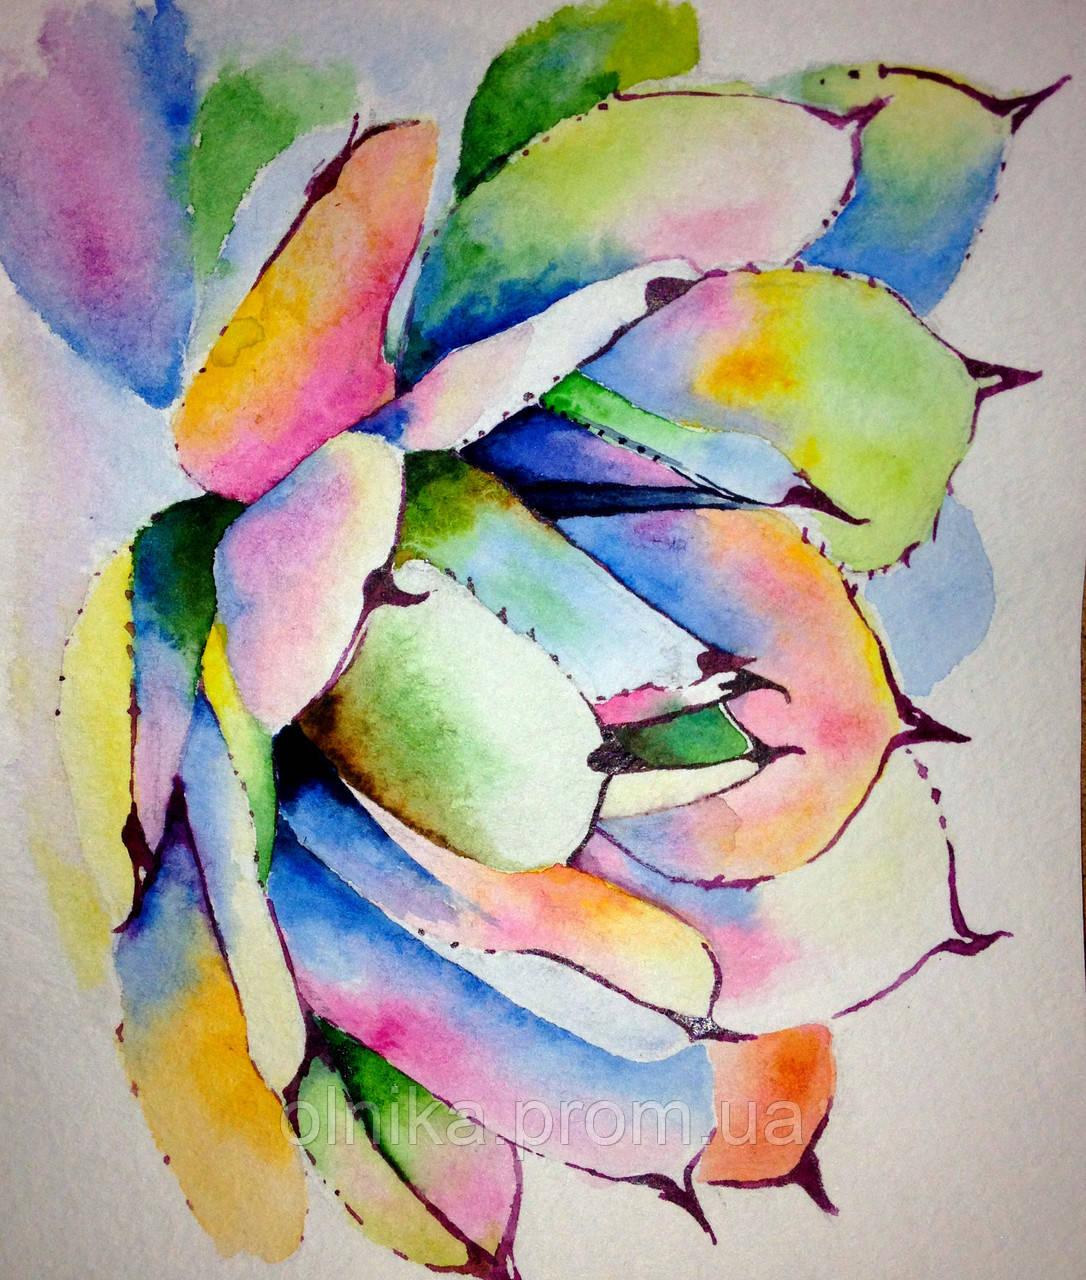 Разноцветный сукулент